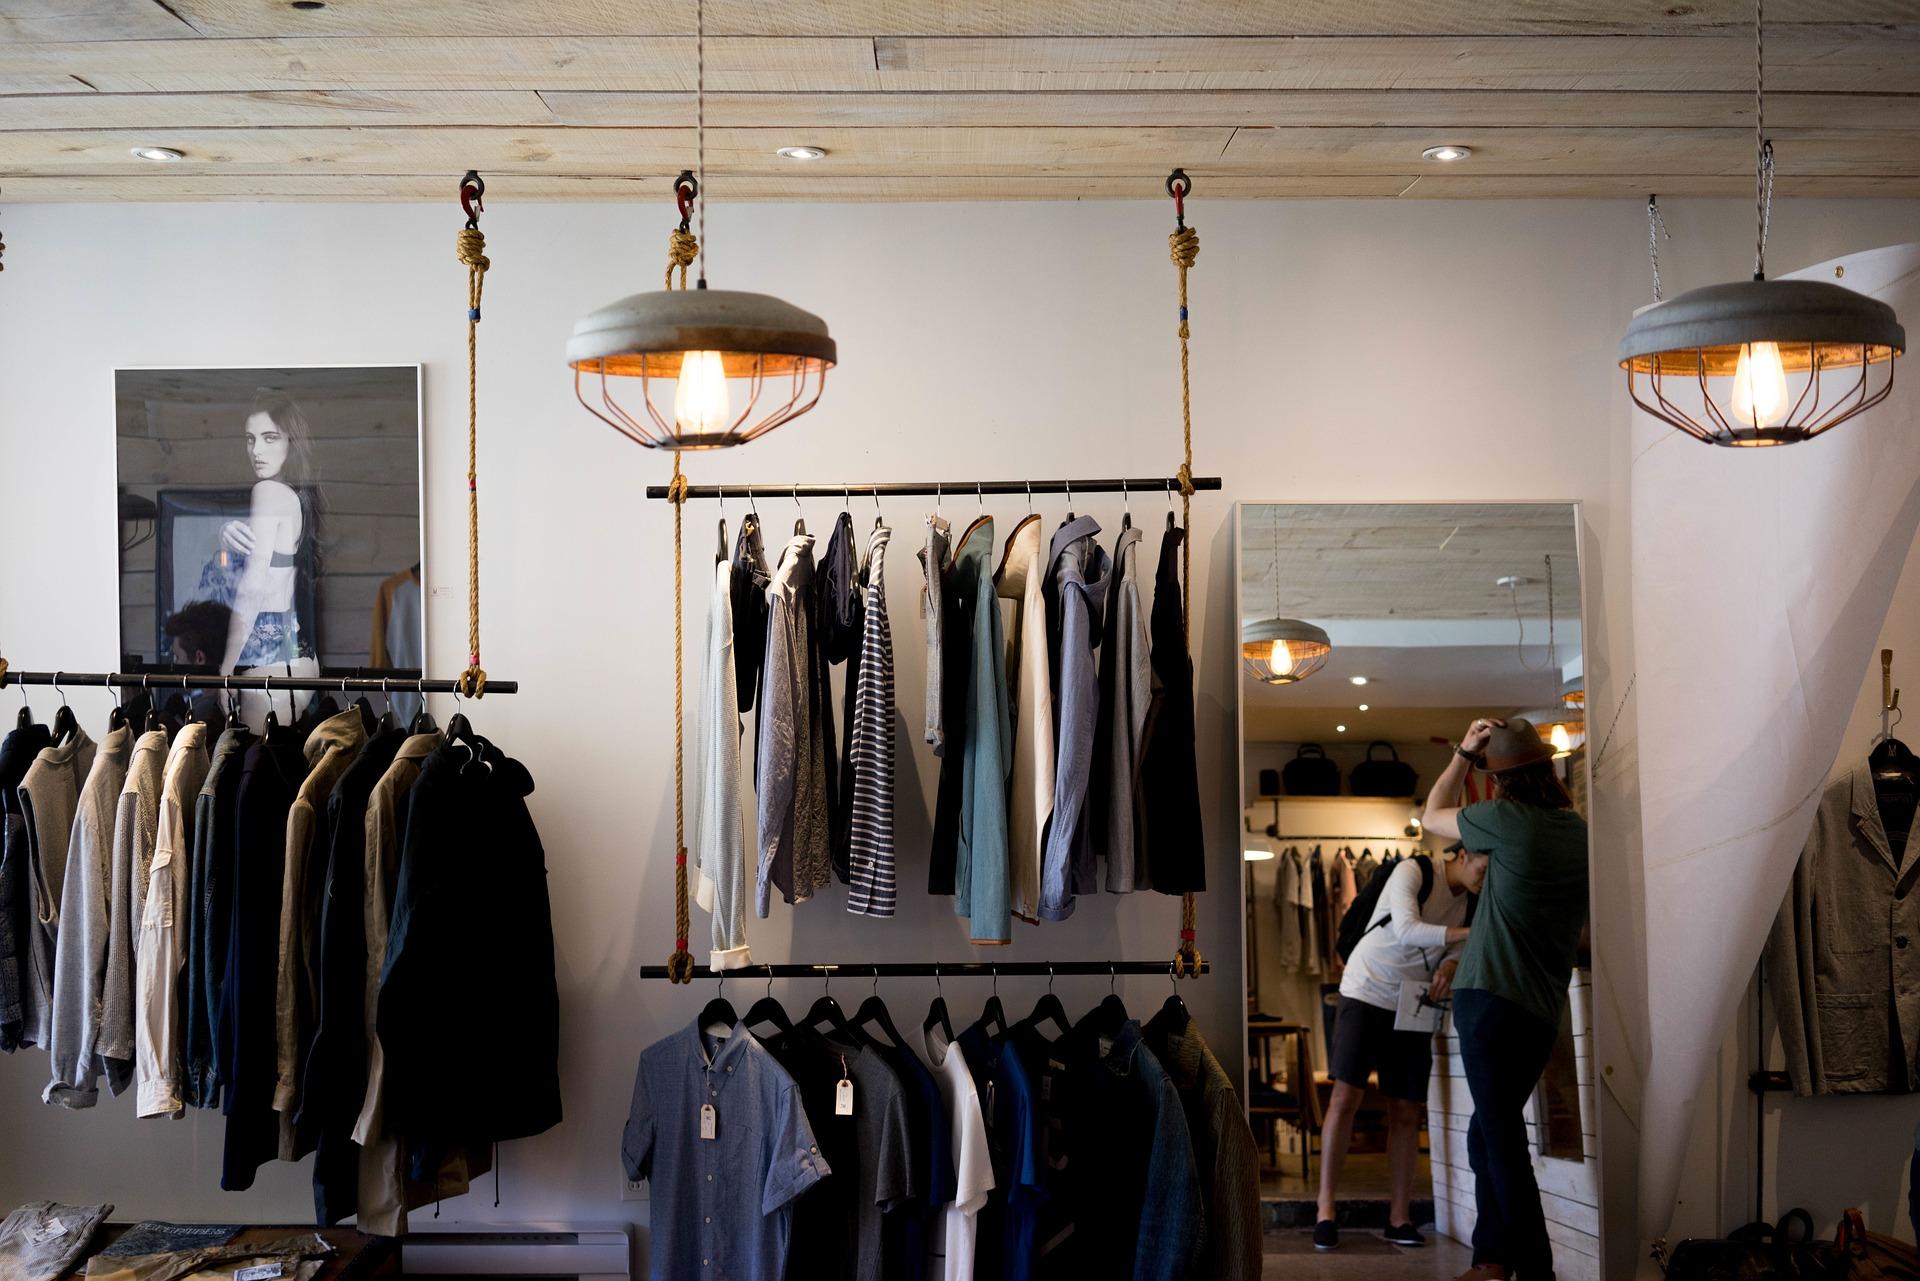 "<img alt=""warm dim-lit lighting inside a men's clothing store"">"